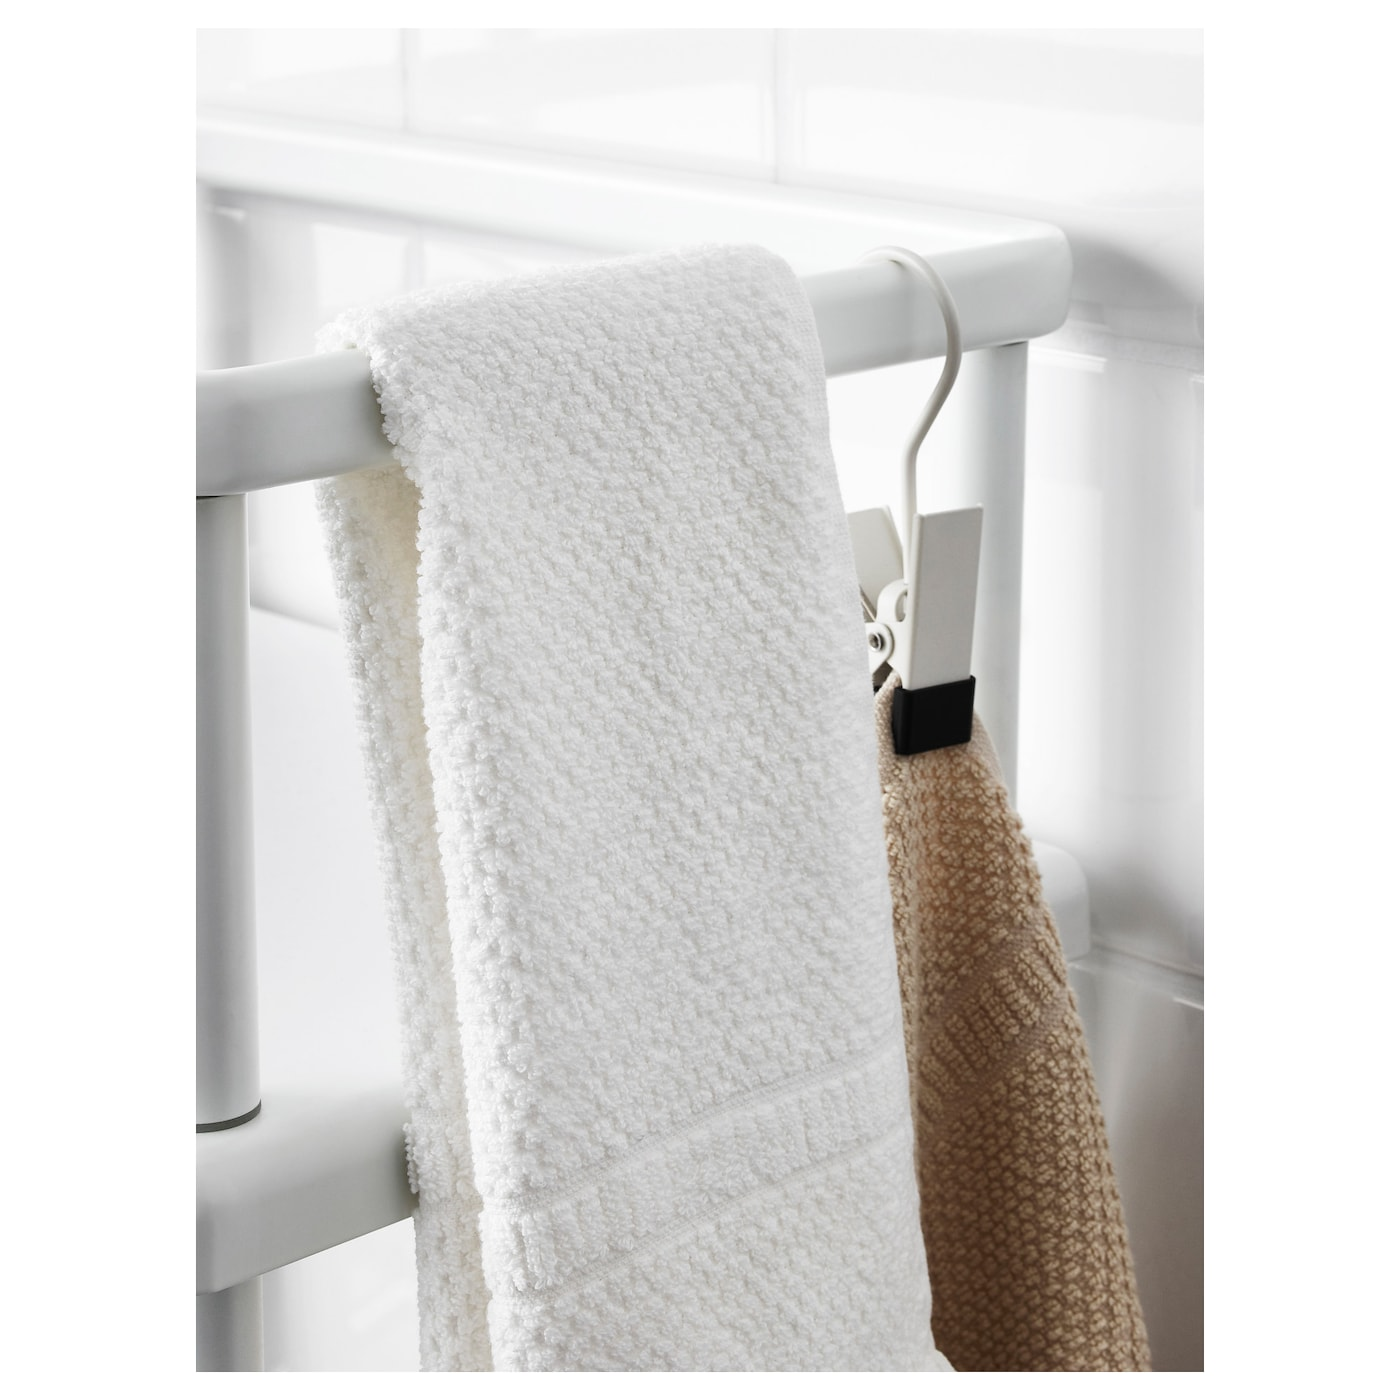 DYNAN Étagère avec porte-serviettes Blanc 40 x 27 x 108 cm - IKEA